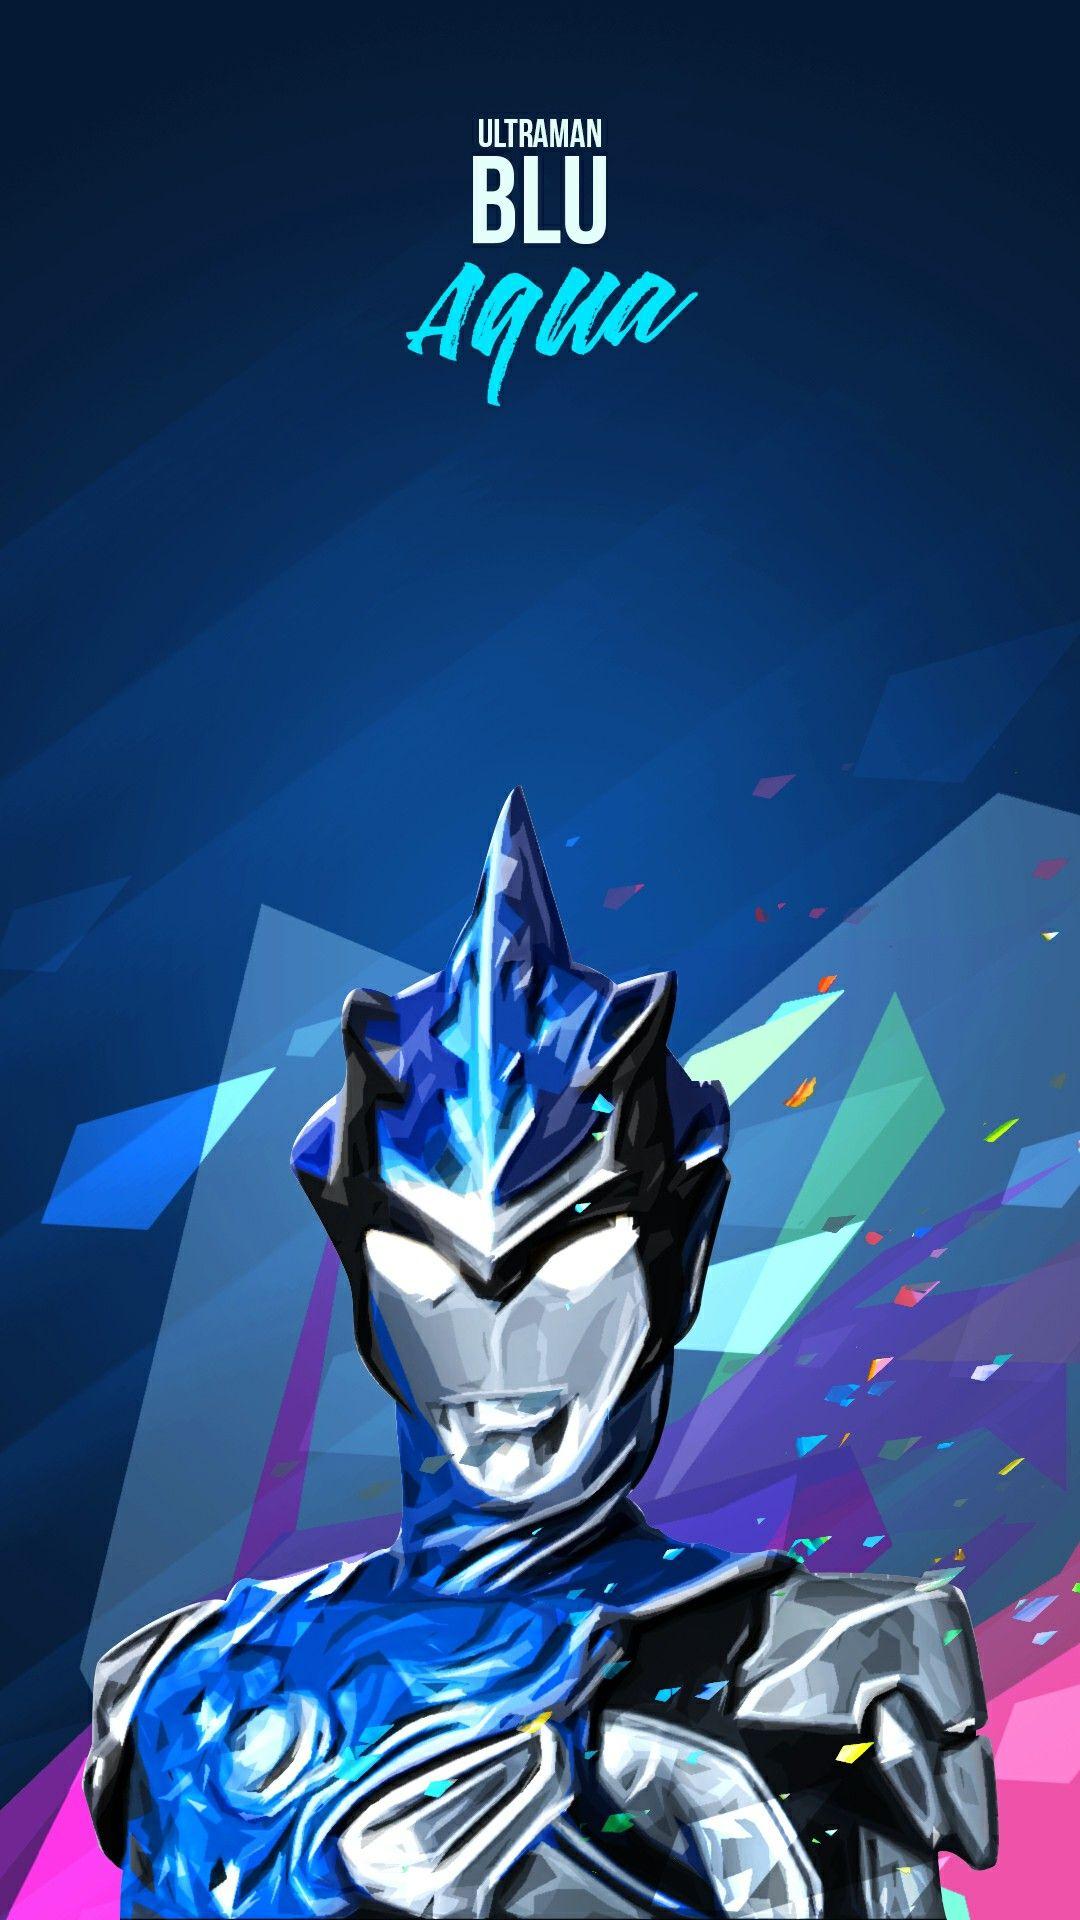 Ultraman blu Kartun, Gambar, Hiburan